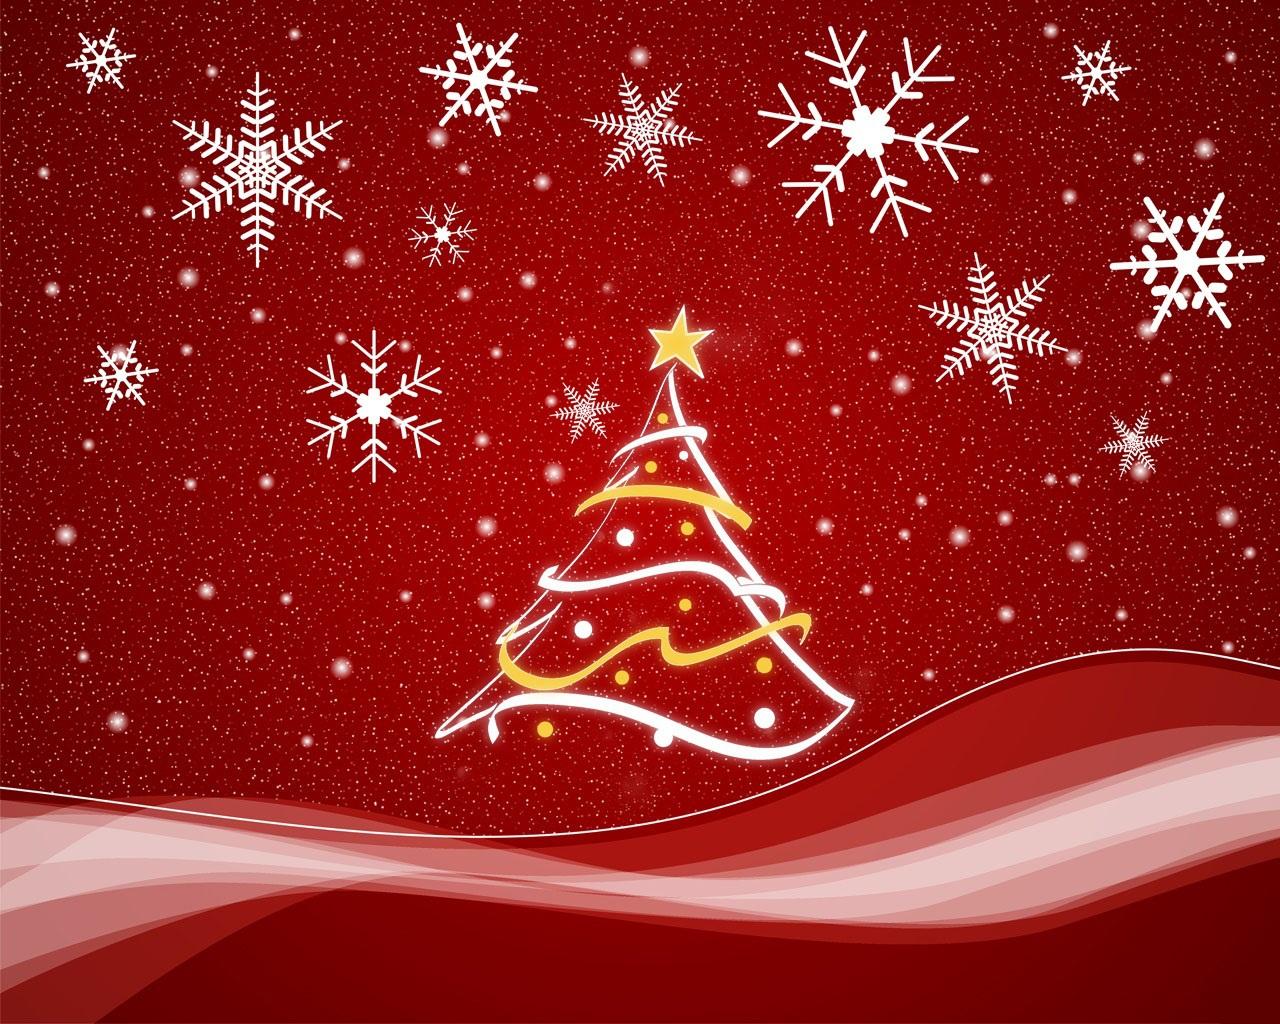 Christmas 2015 Red Art